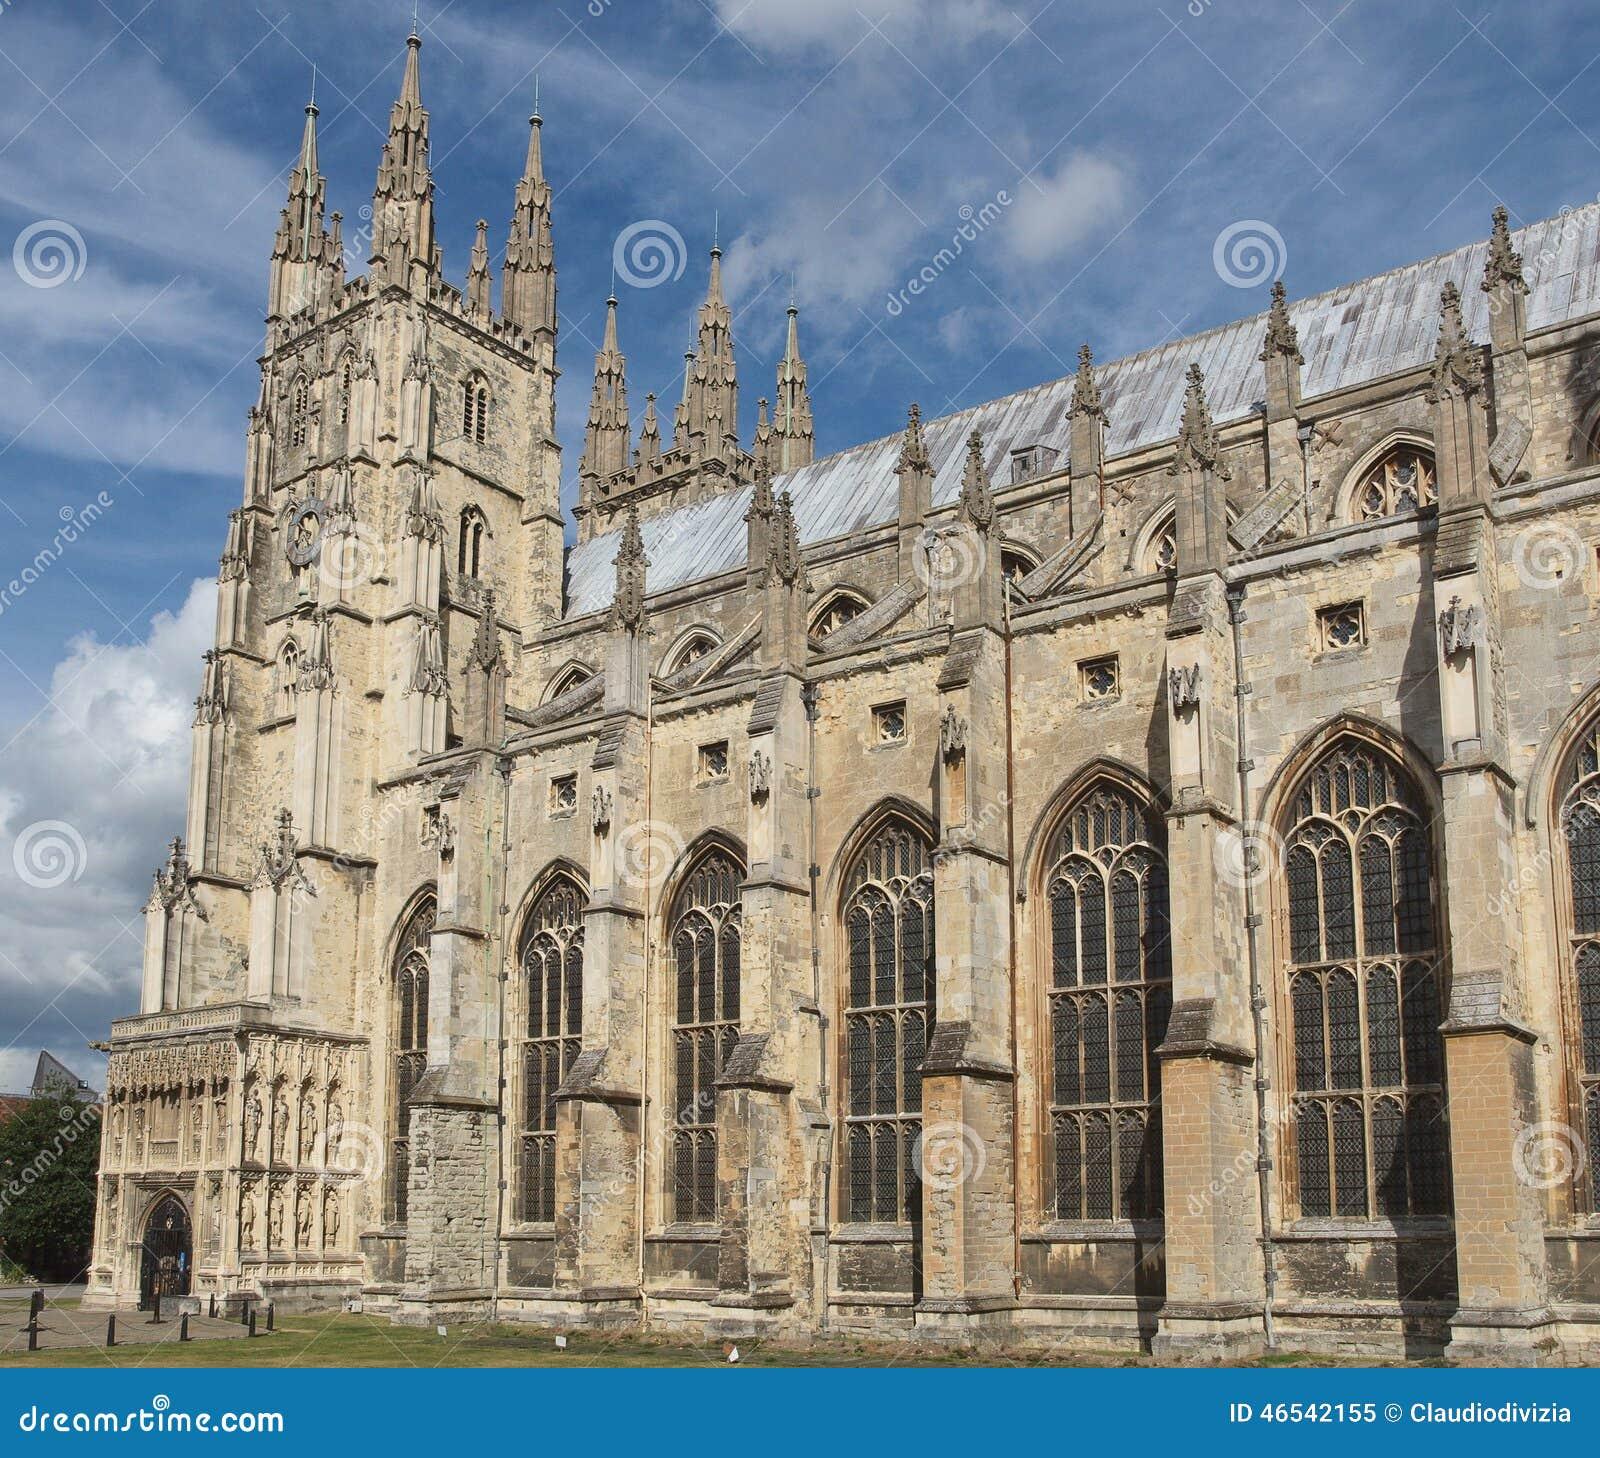 Catedral de Cantorbery